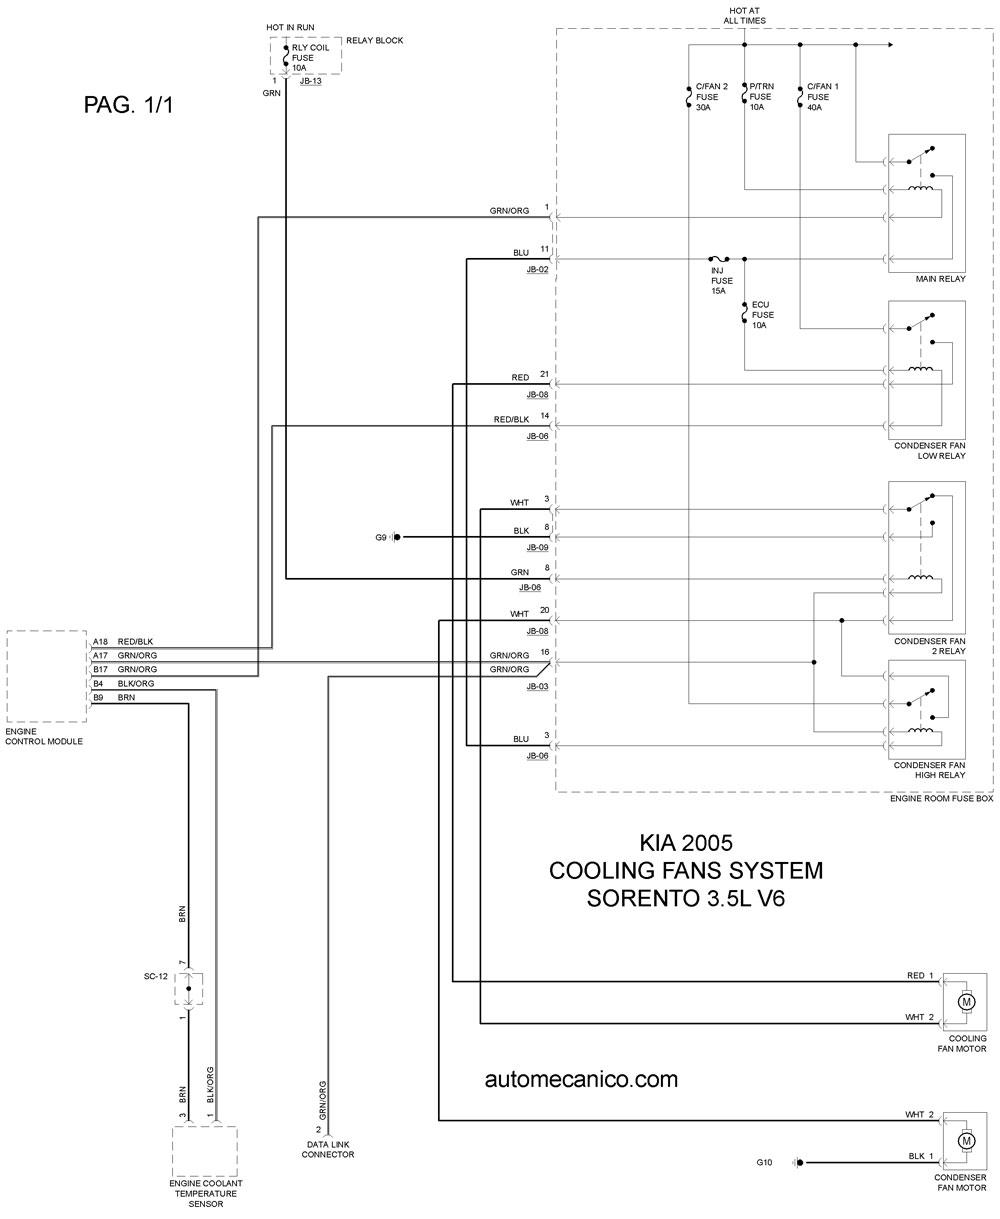 Circuito Kia 2017 : Kia cooling fans system diagramas ventiladores